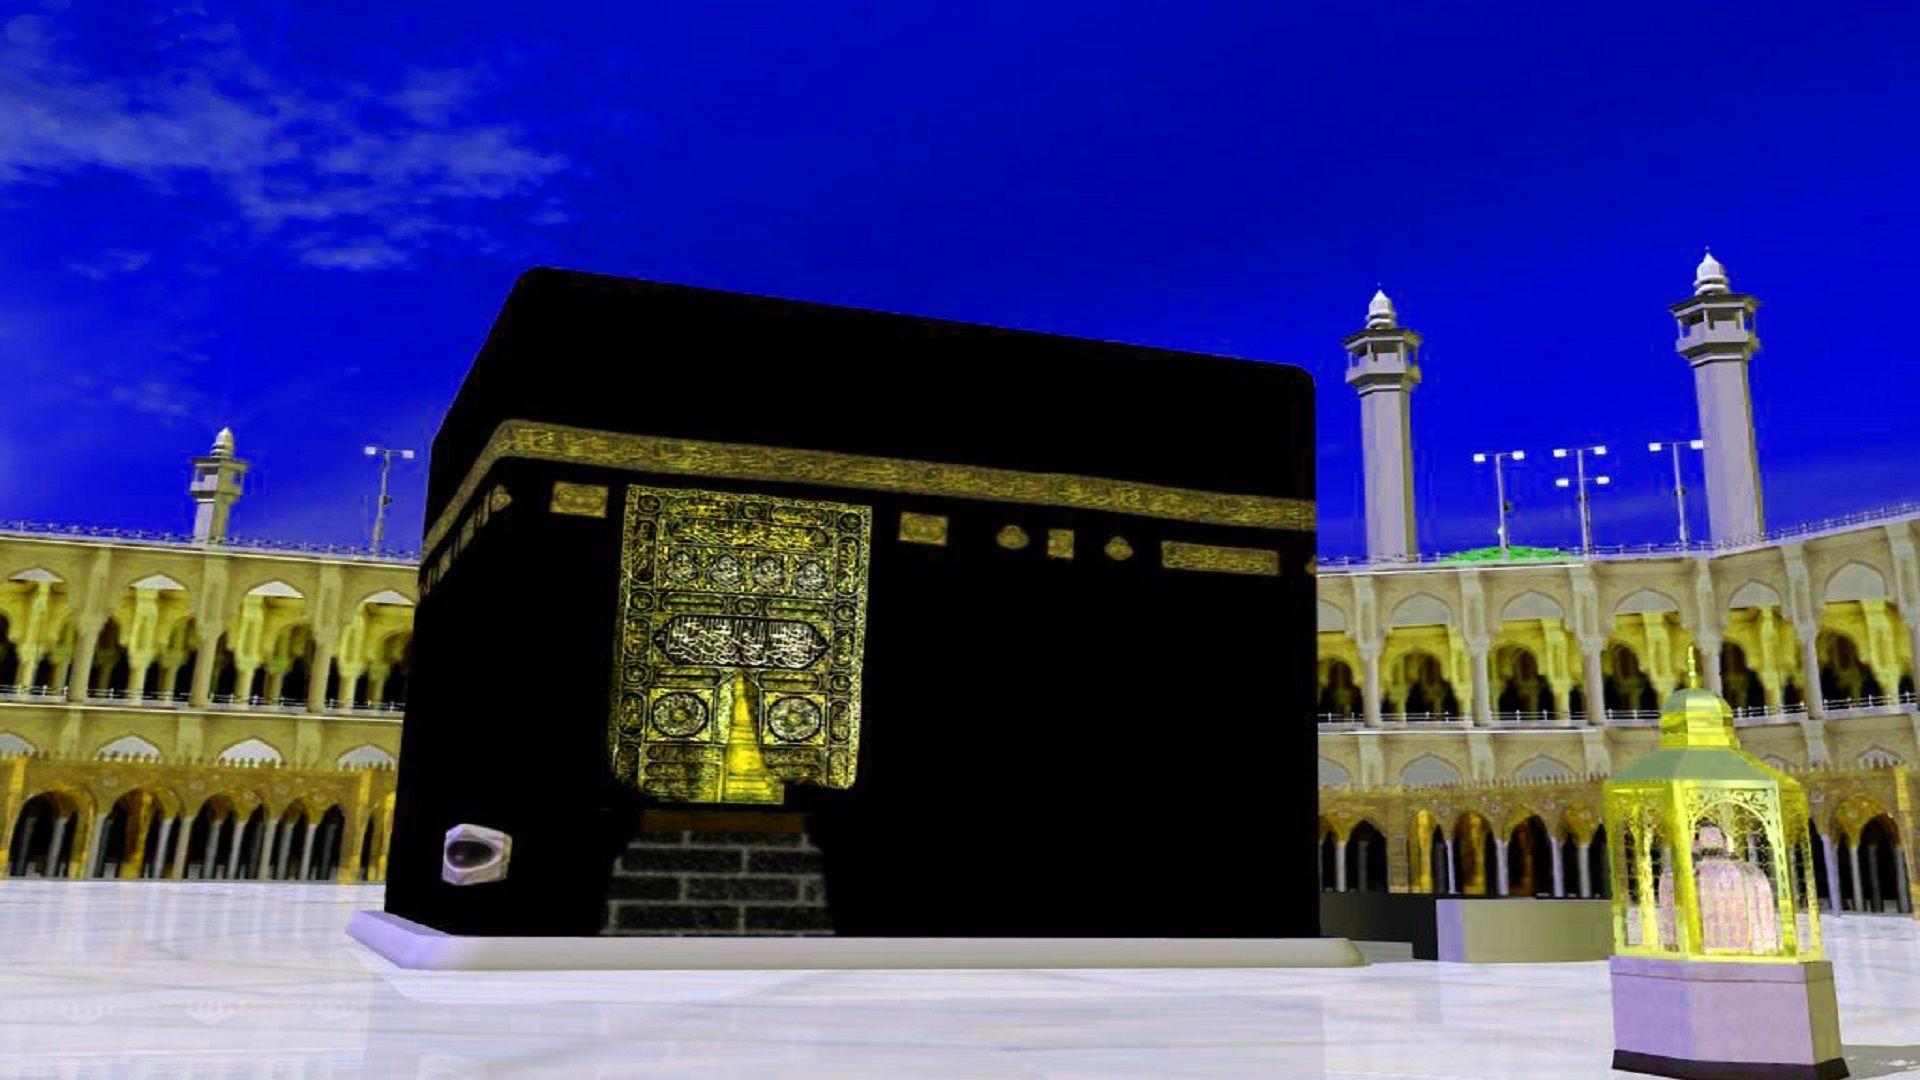 1920x1080 Makkah Kaaba 3d Live Wallpaper Makkah Hd Images Download 1920x1080 Wallpaper Teahub Io